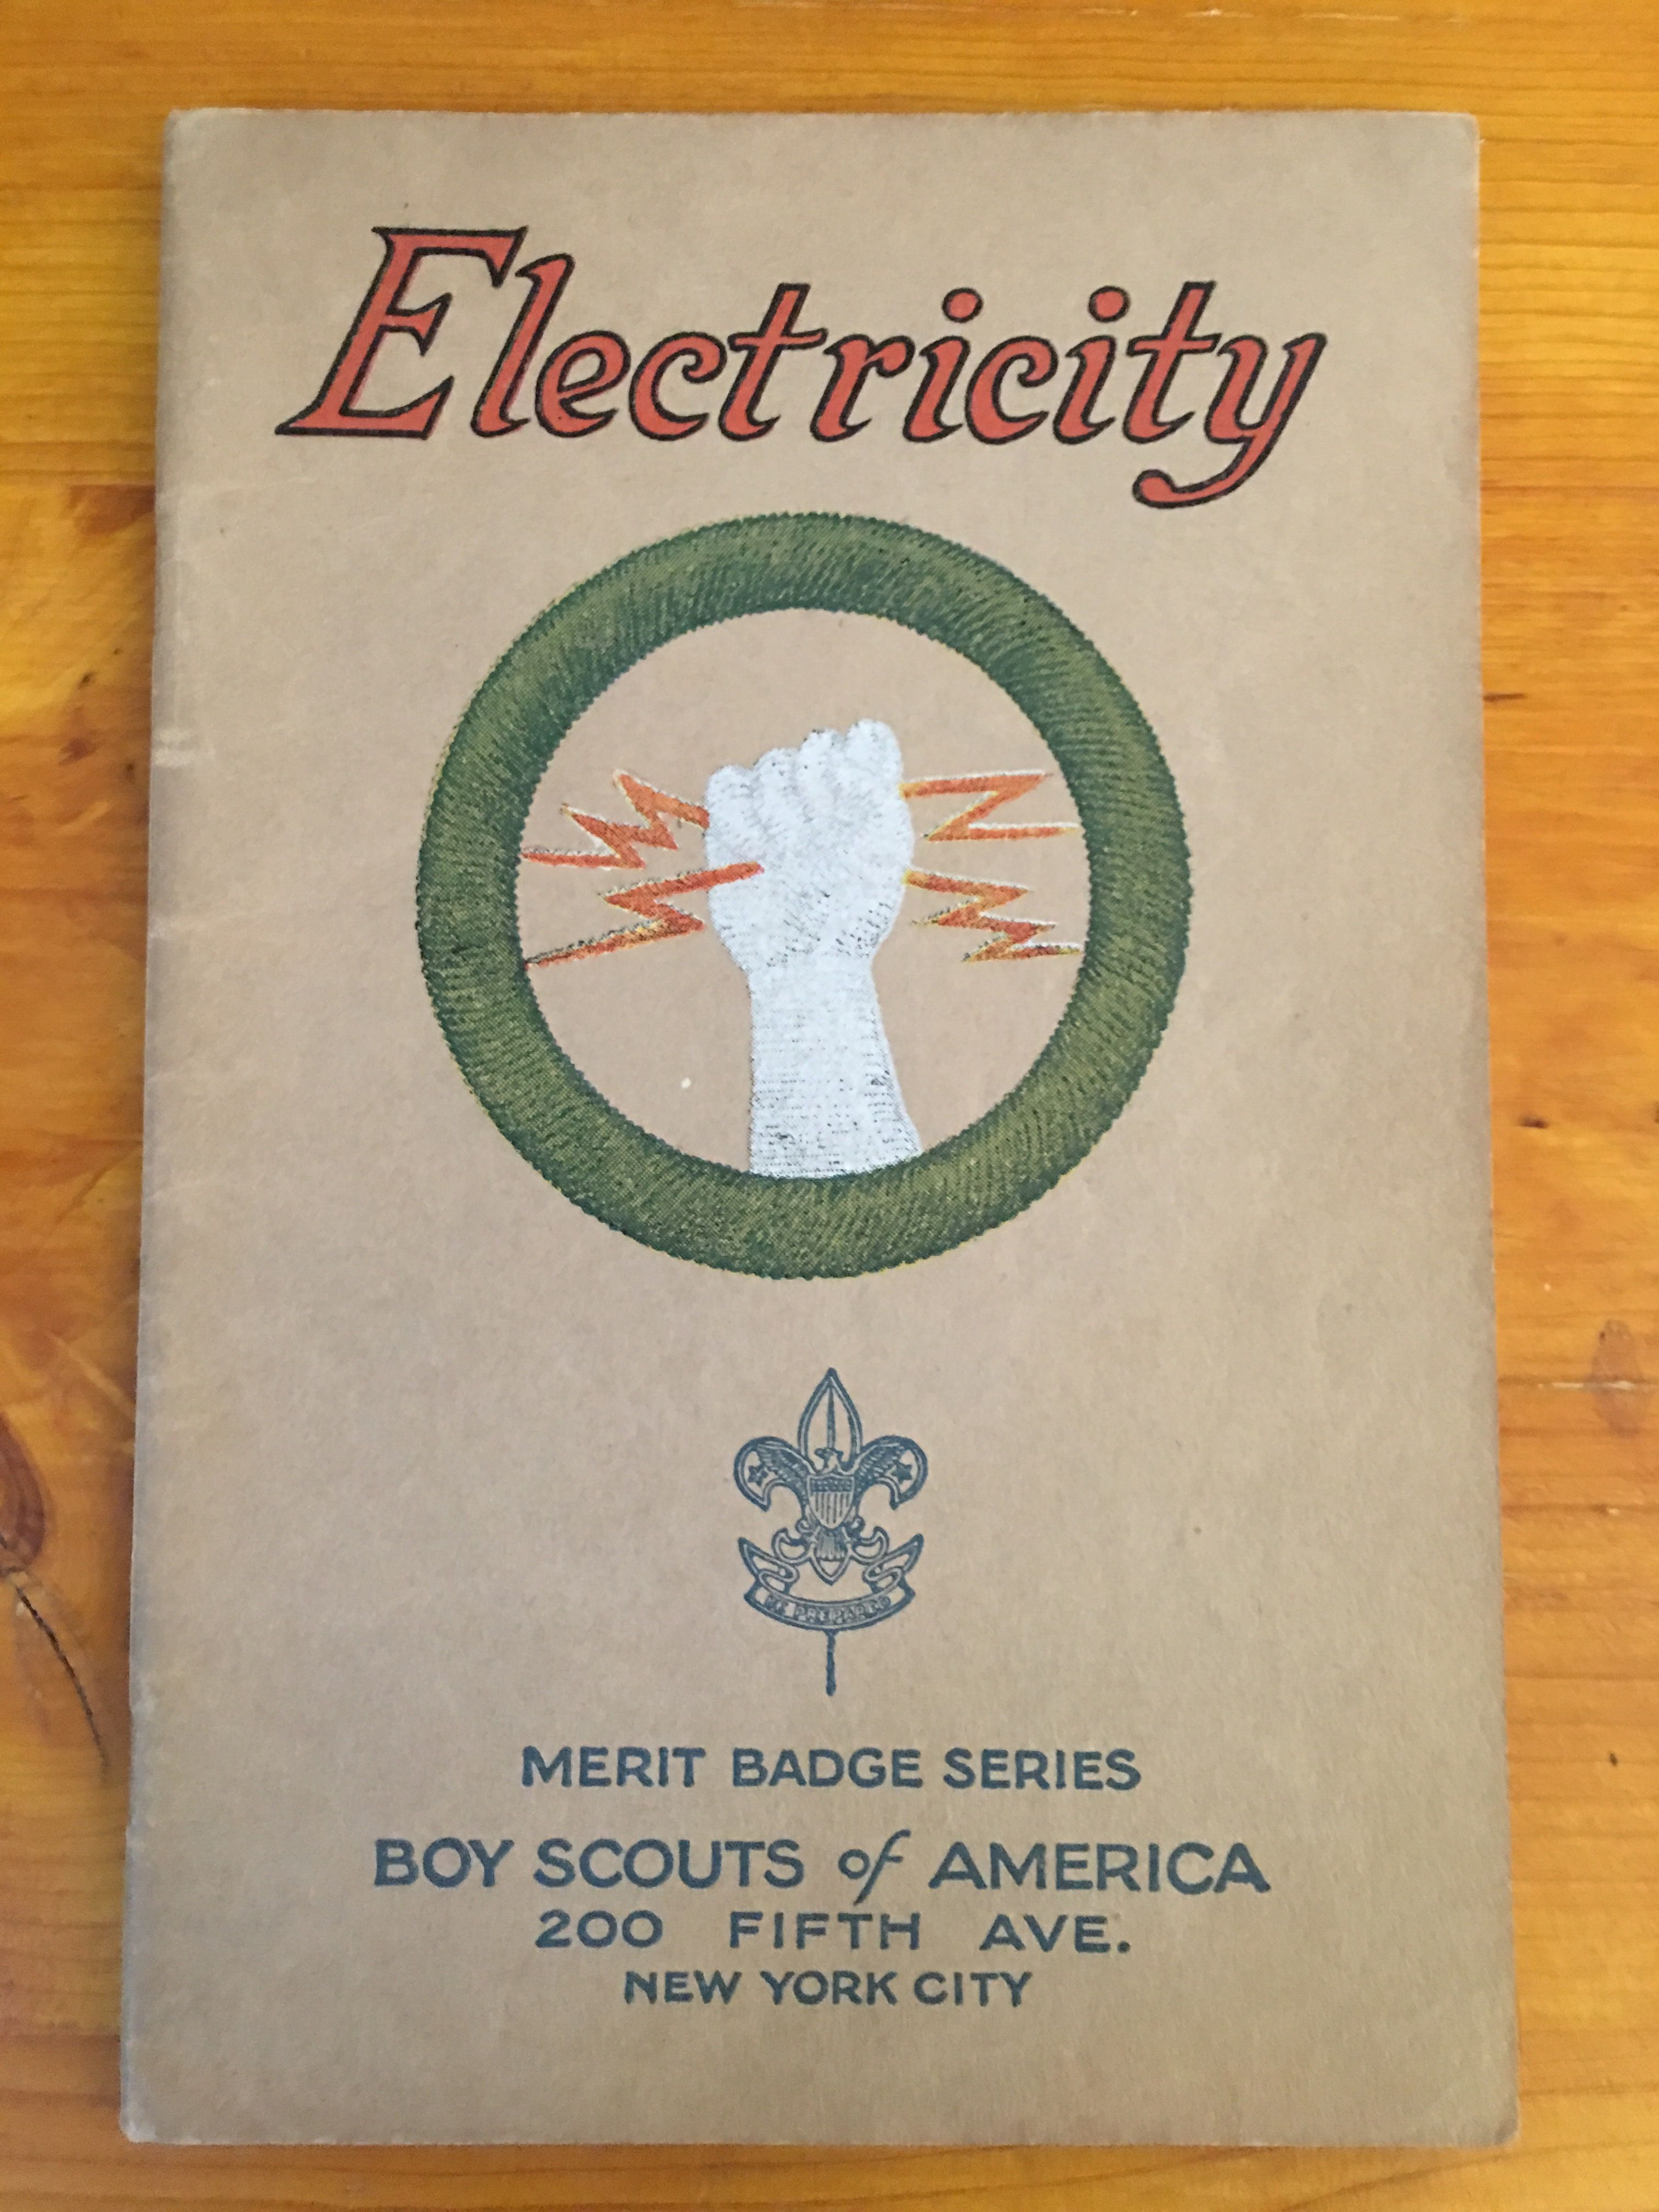 Electricity Merit Badge Book